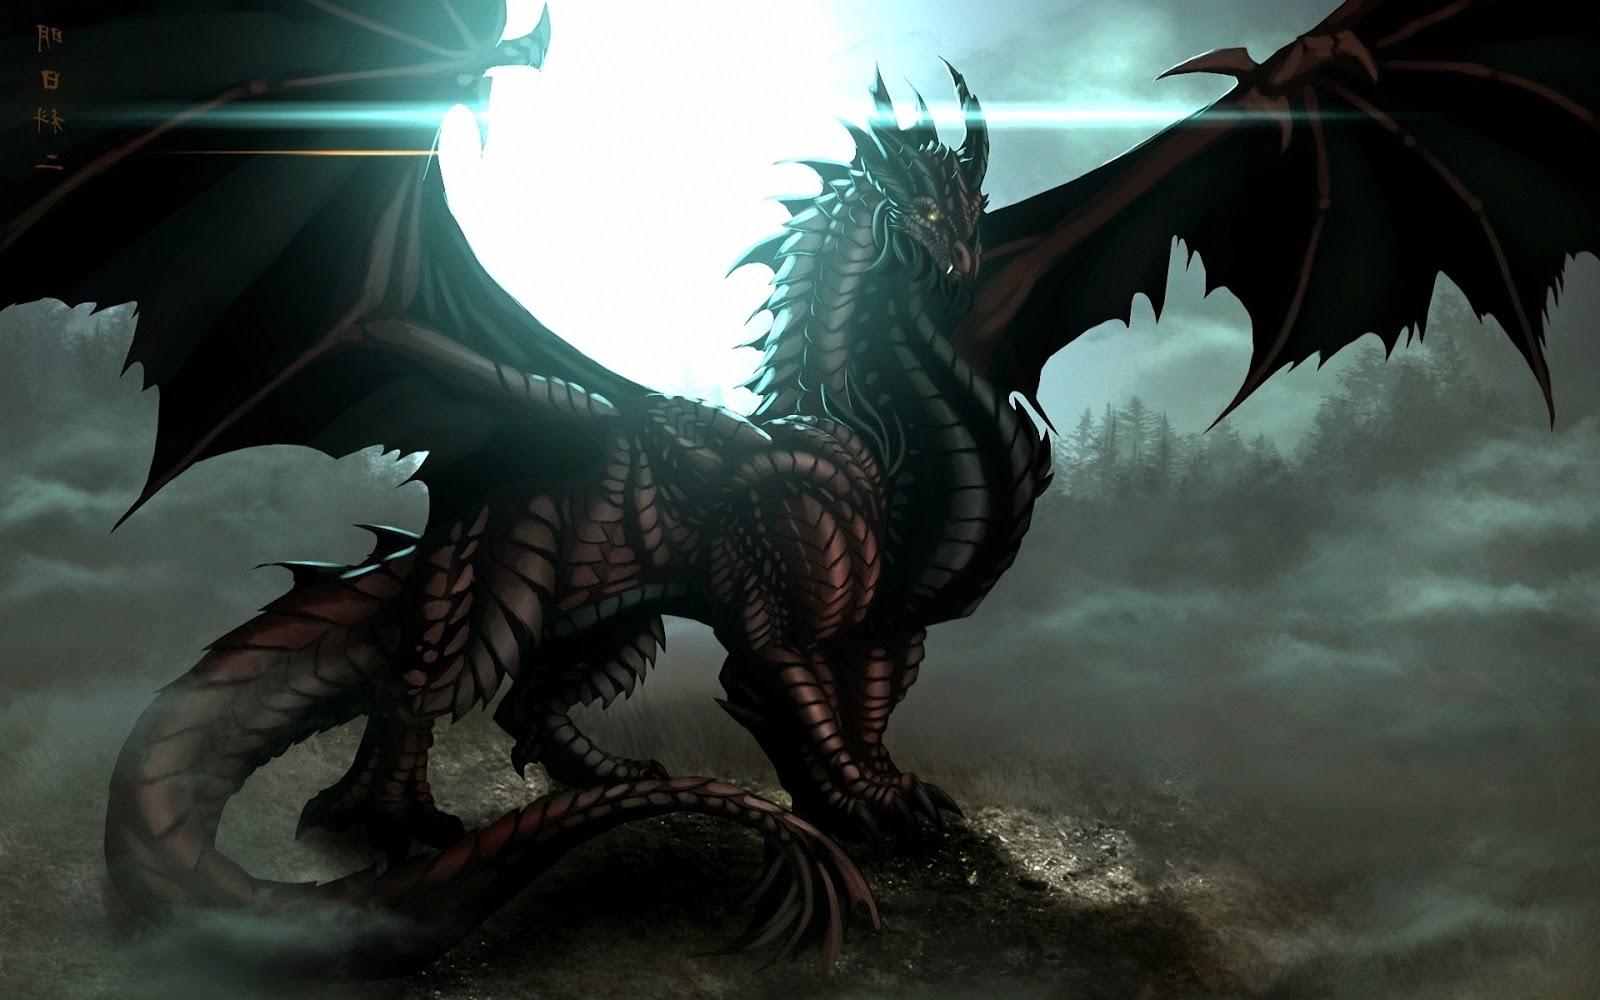 mitologia dragones ser mitologico. Black Bedroom Furniture Sets. Home Design Ideas